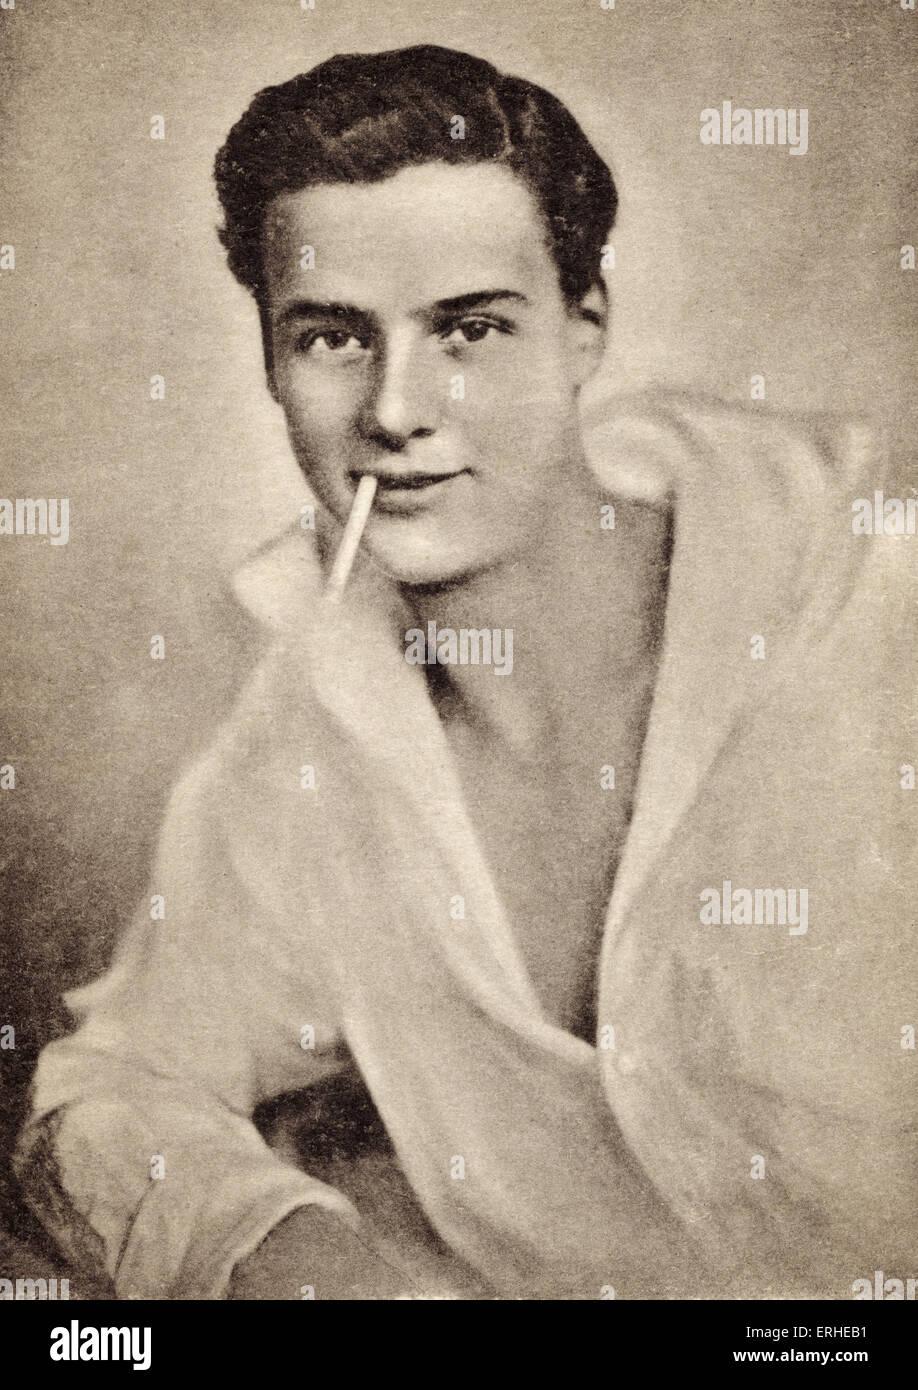 Walter Slezak - Austro-Hungarian actor and son of the Wagnerian opera singer Leo Slezak.  1902-1983. Publicity still. - Stock Image